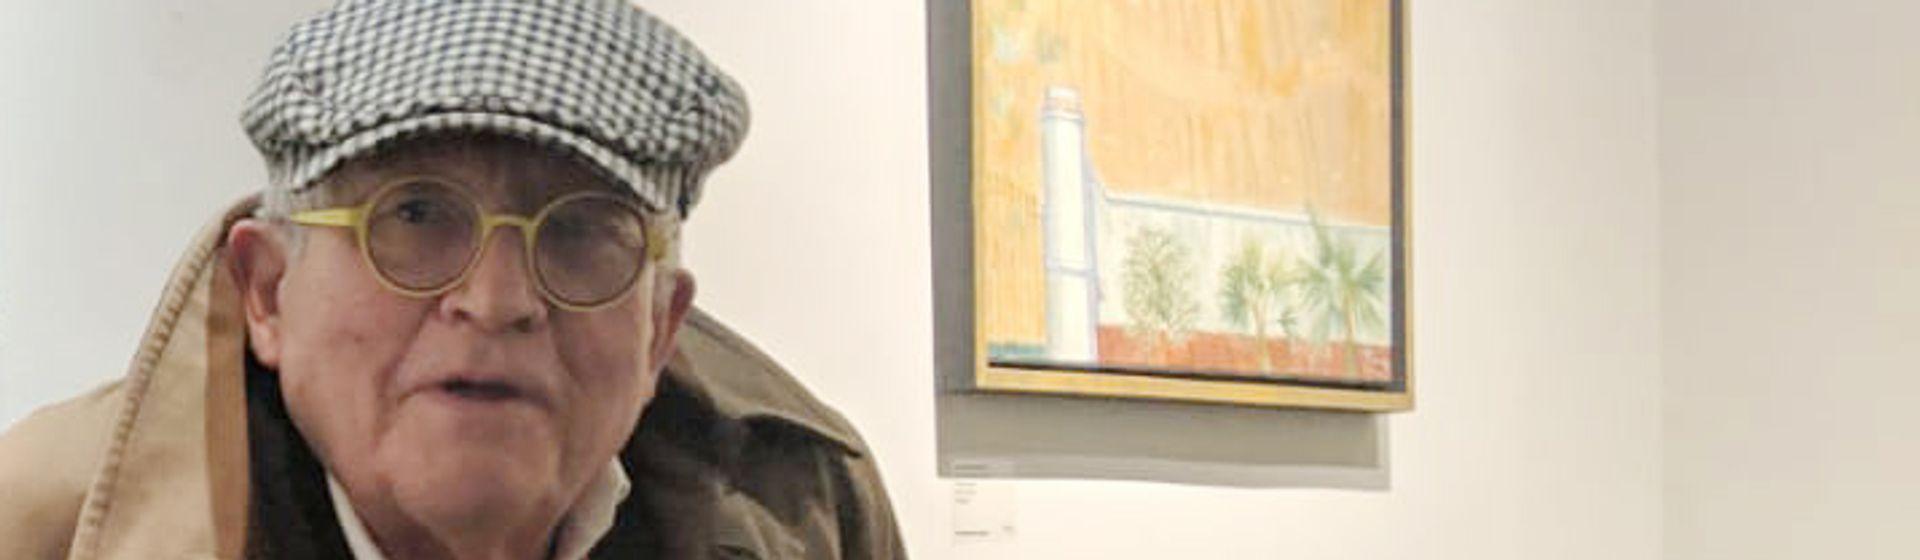 David Hockney Photo: David Clack